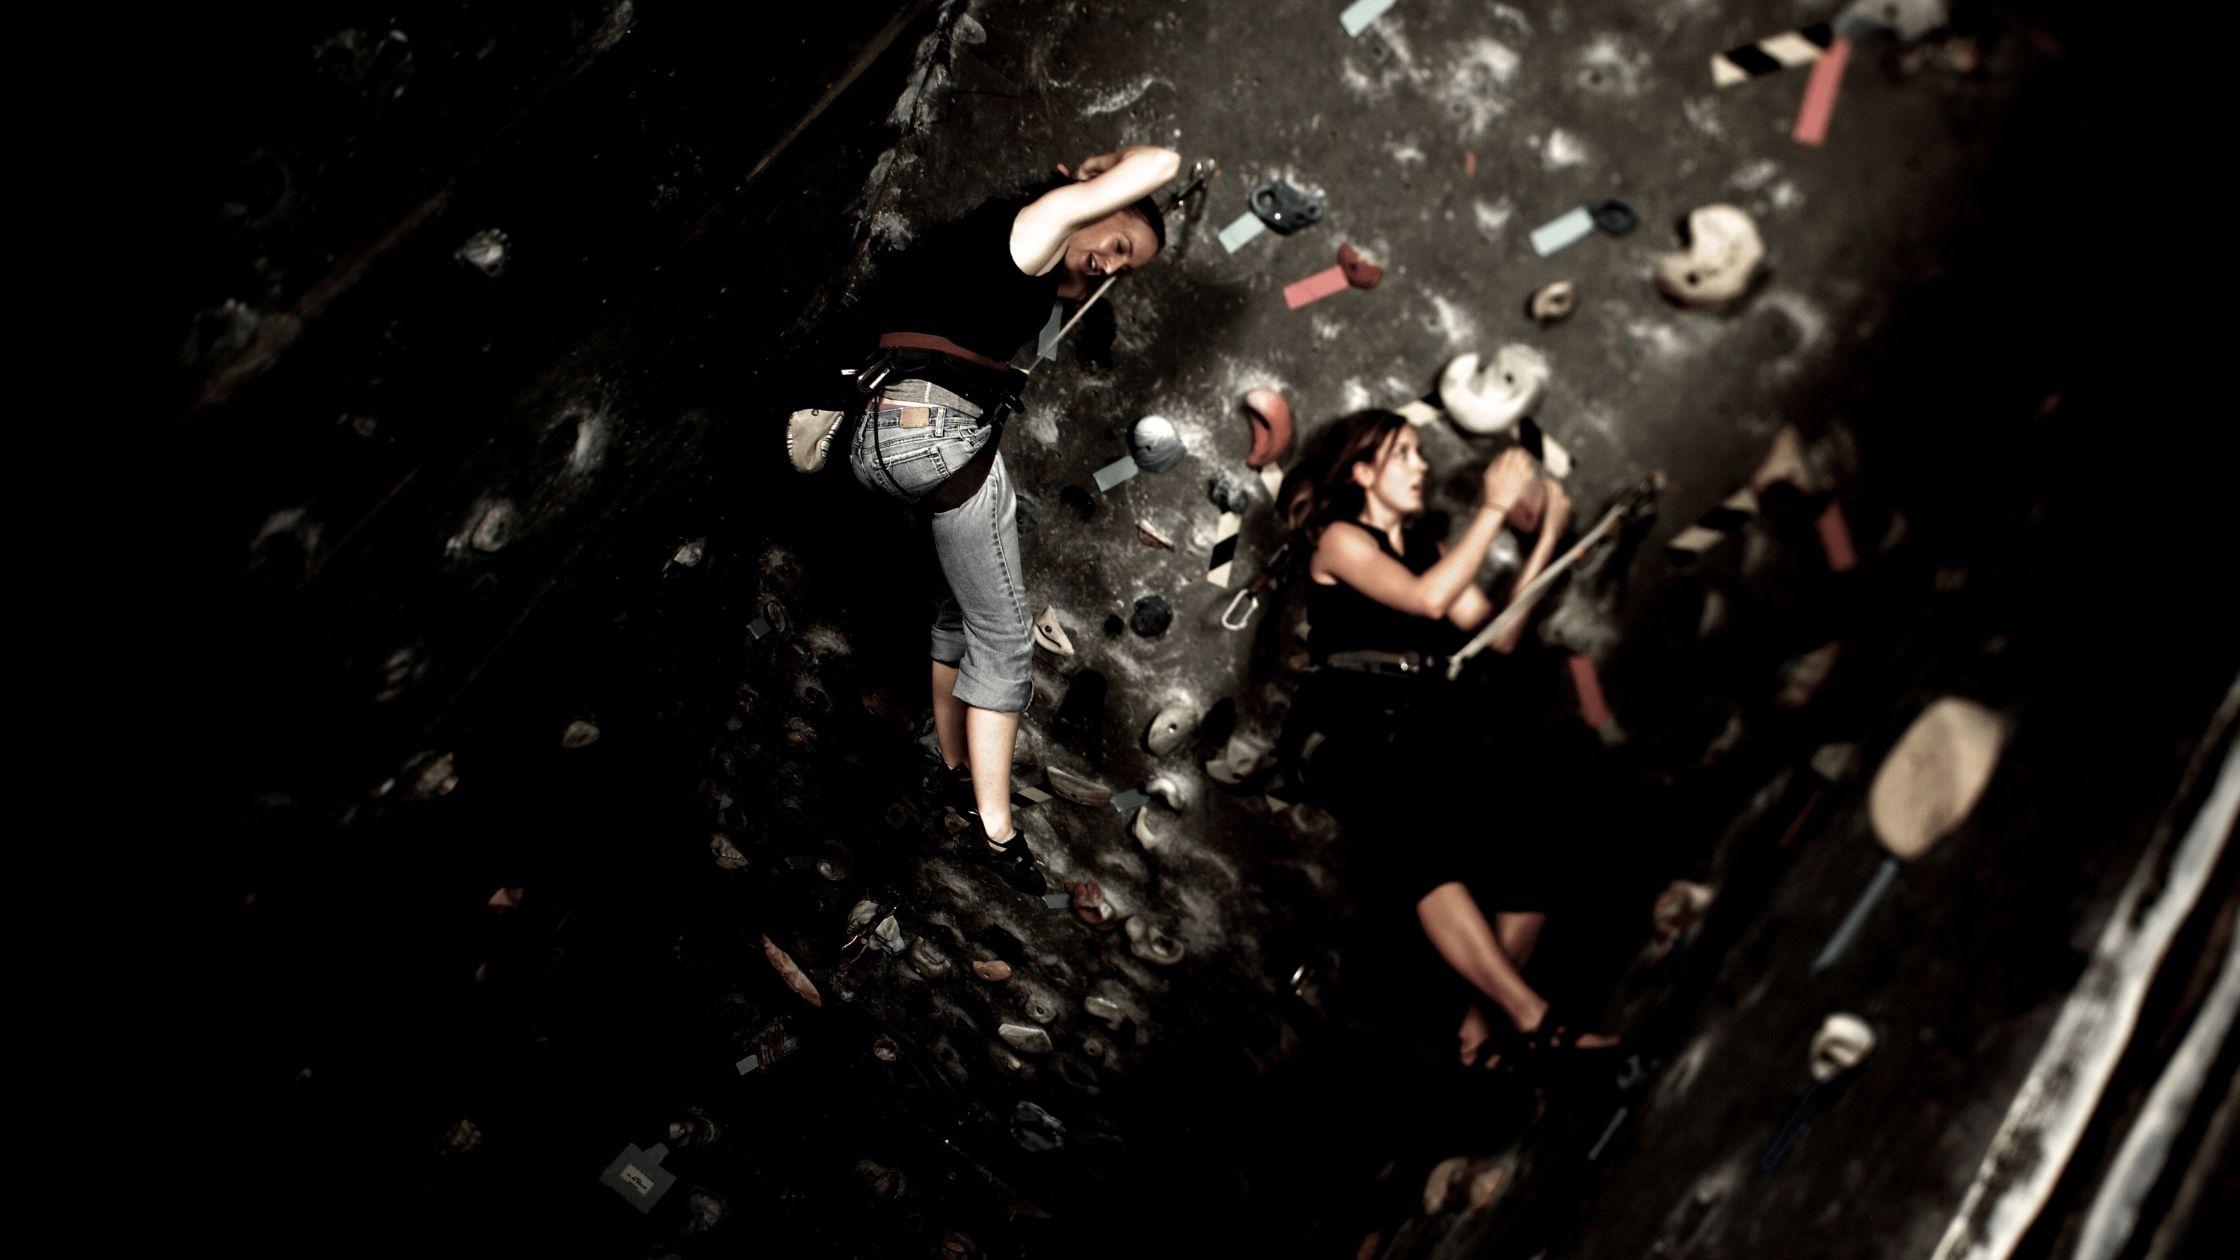 types of gyms: rock climbing gym